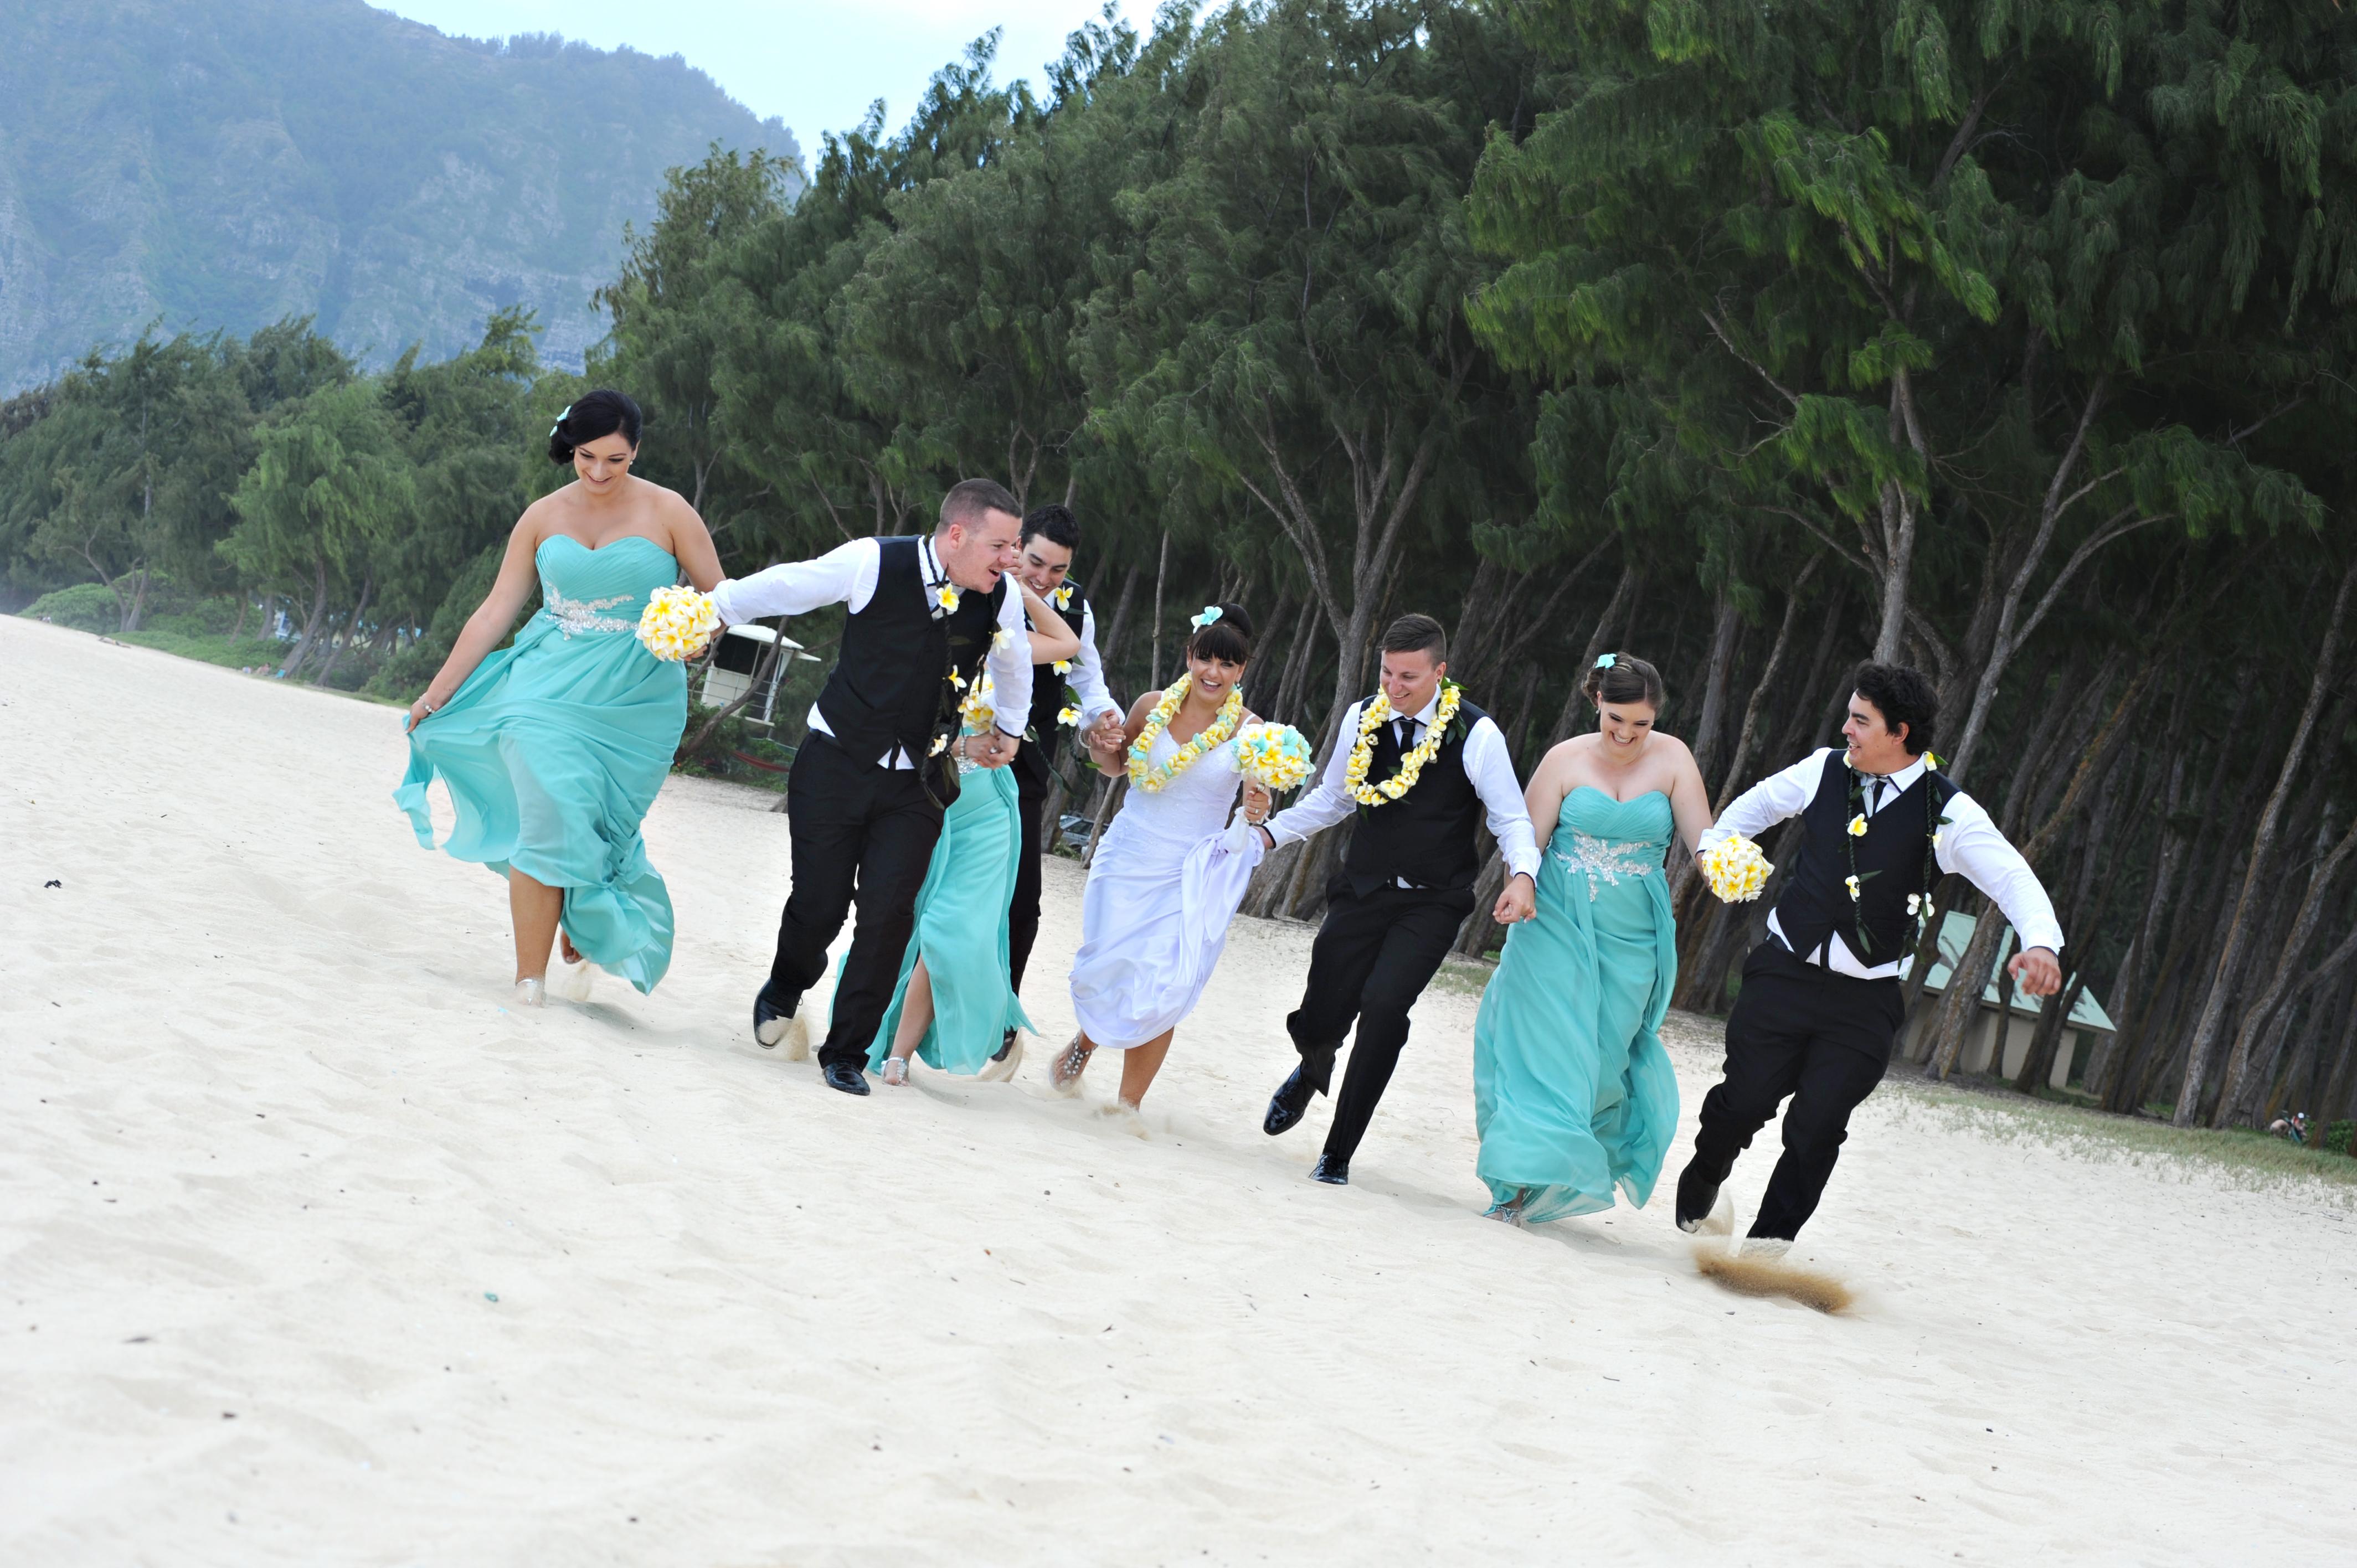 Alohaislandweddings.com- Wedding Picture in Hawaii-16